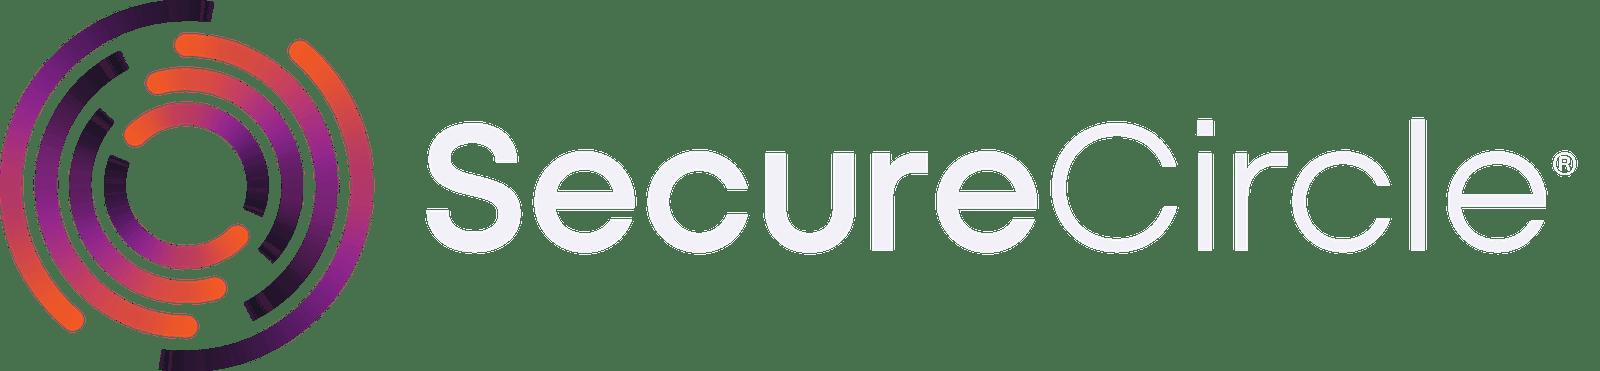 SecureCircle logo dark background